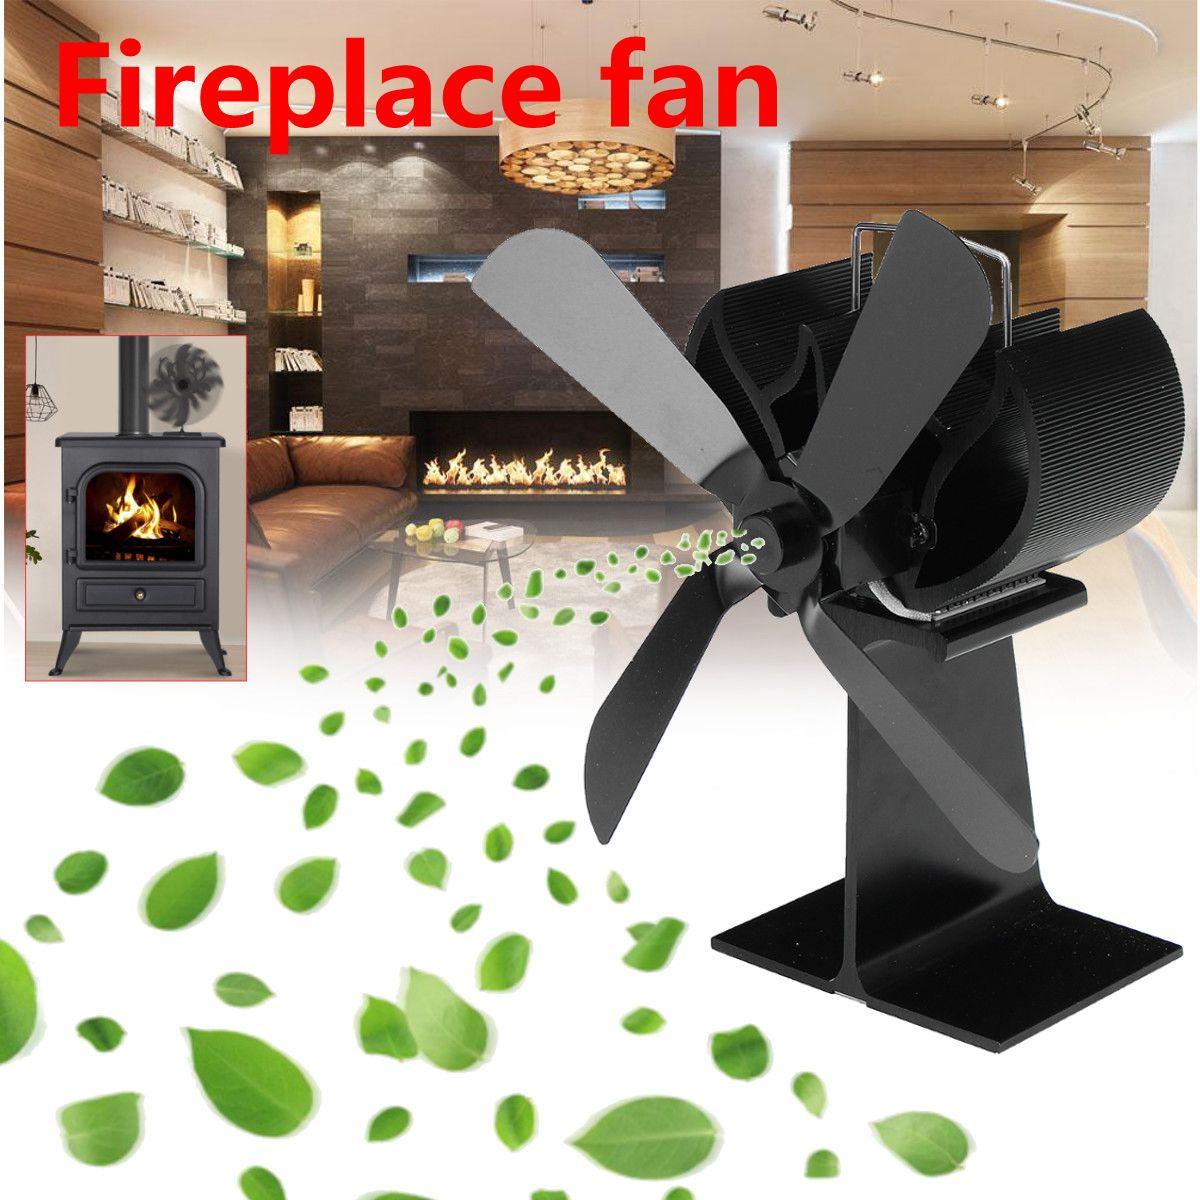 Черная плита вентилятор 4 лезвия Вентилятор для камина тепла питание komin древесины горелки экологический вентилятор дружественных тихий до...